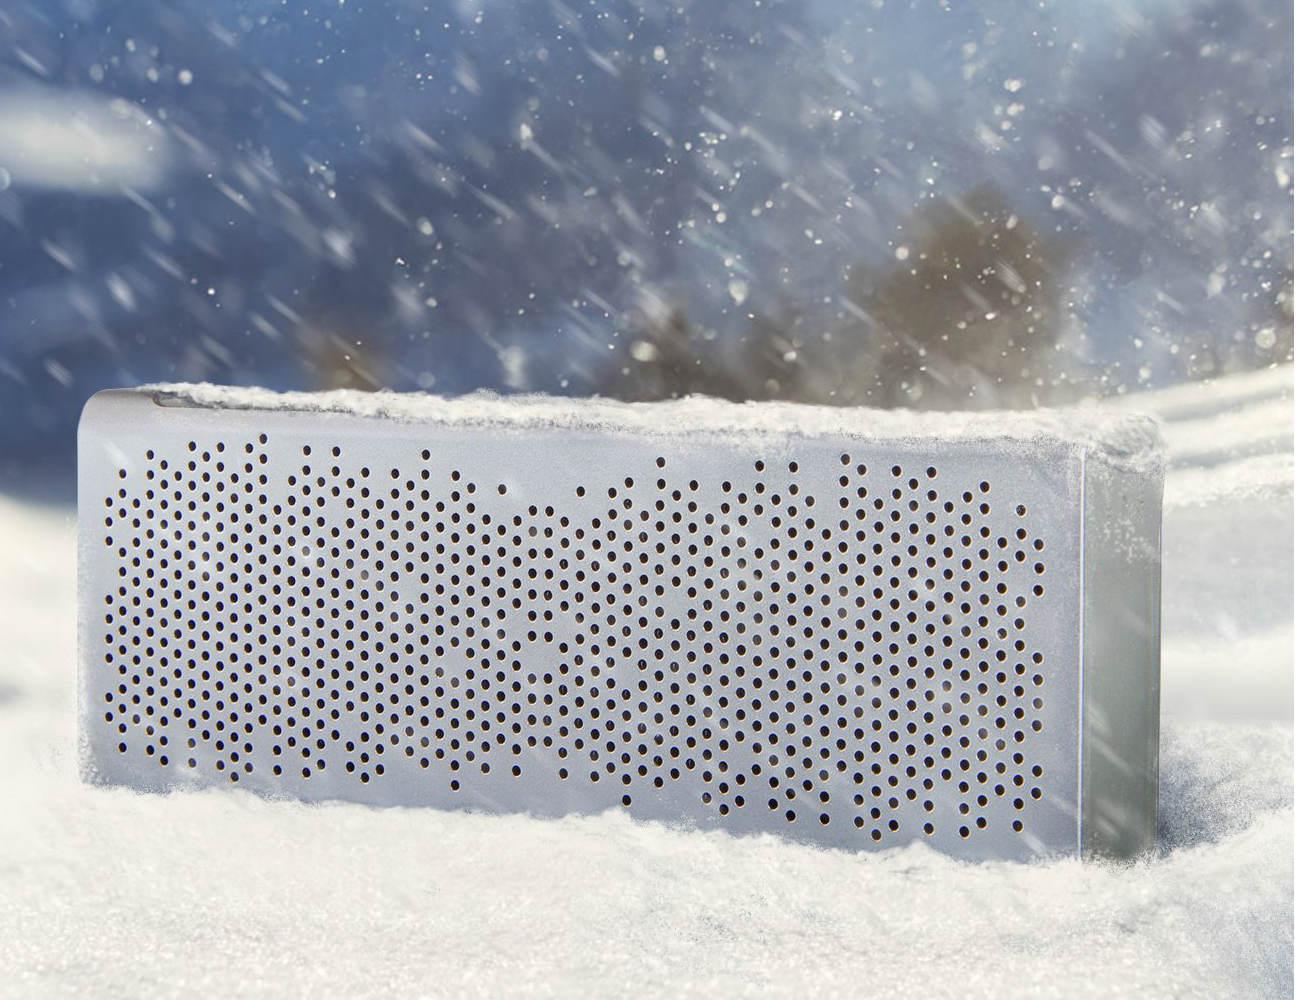 Waterproof Portable Speaker From Inateck